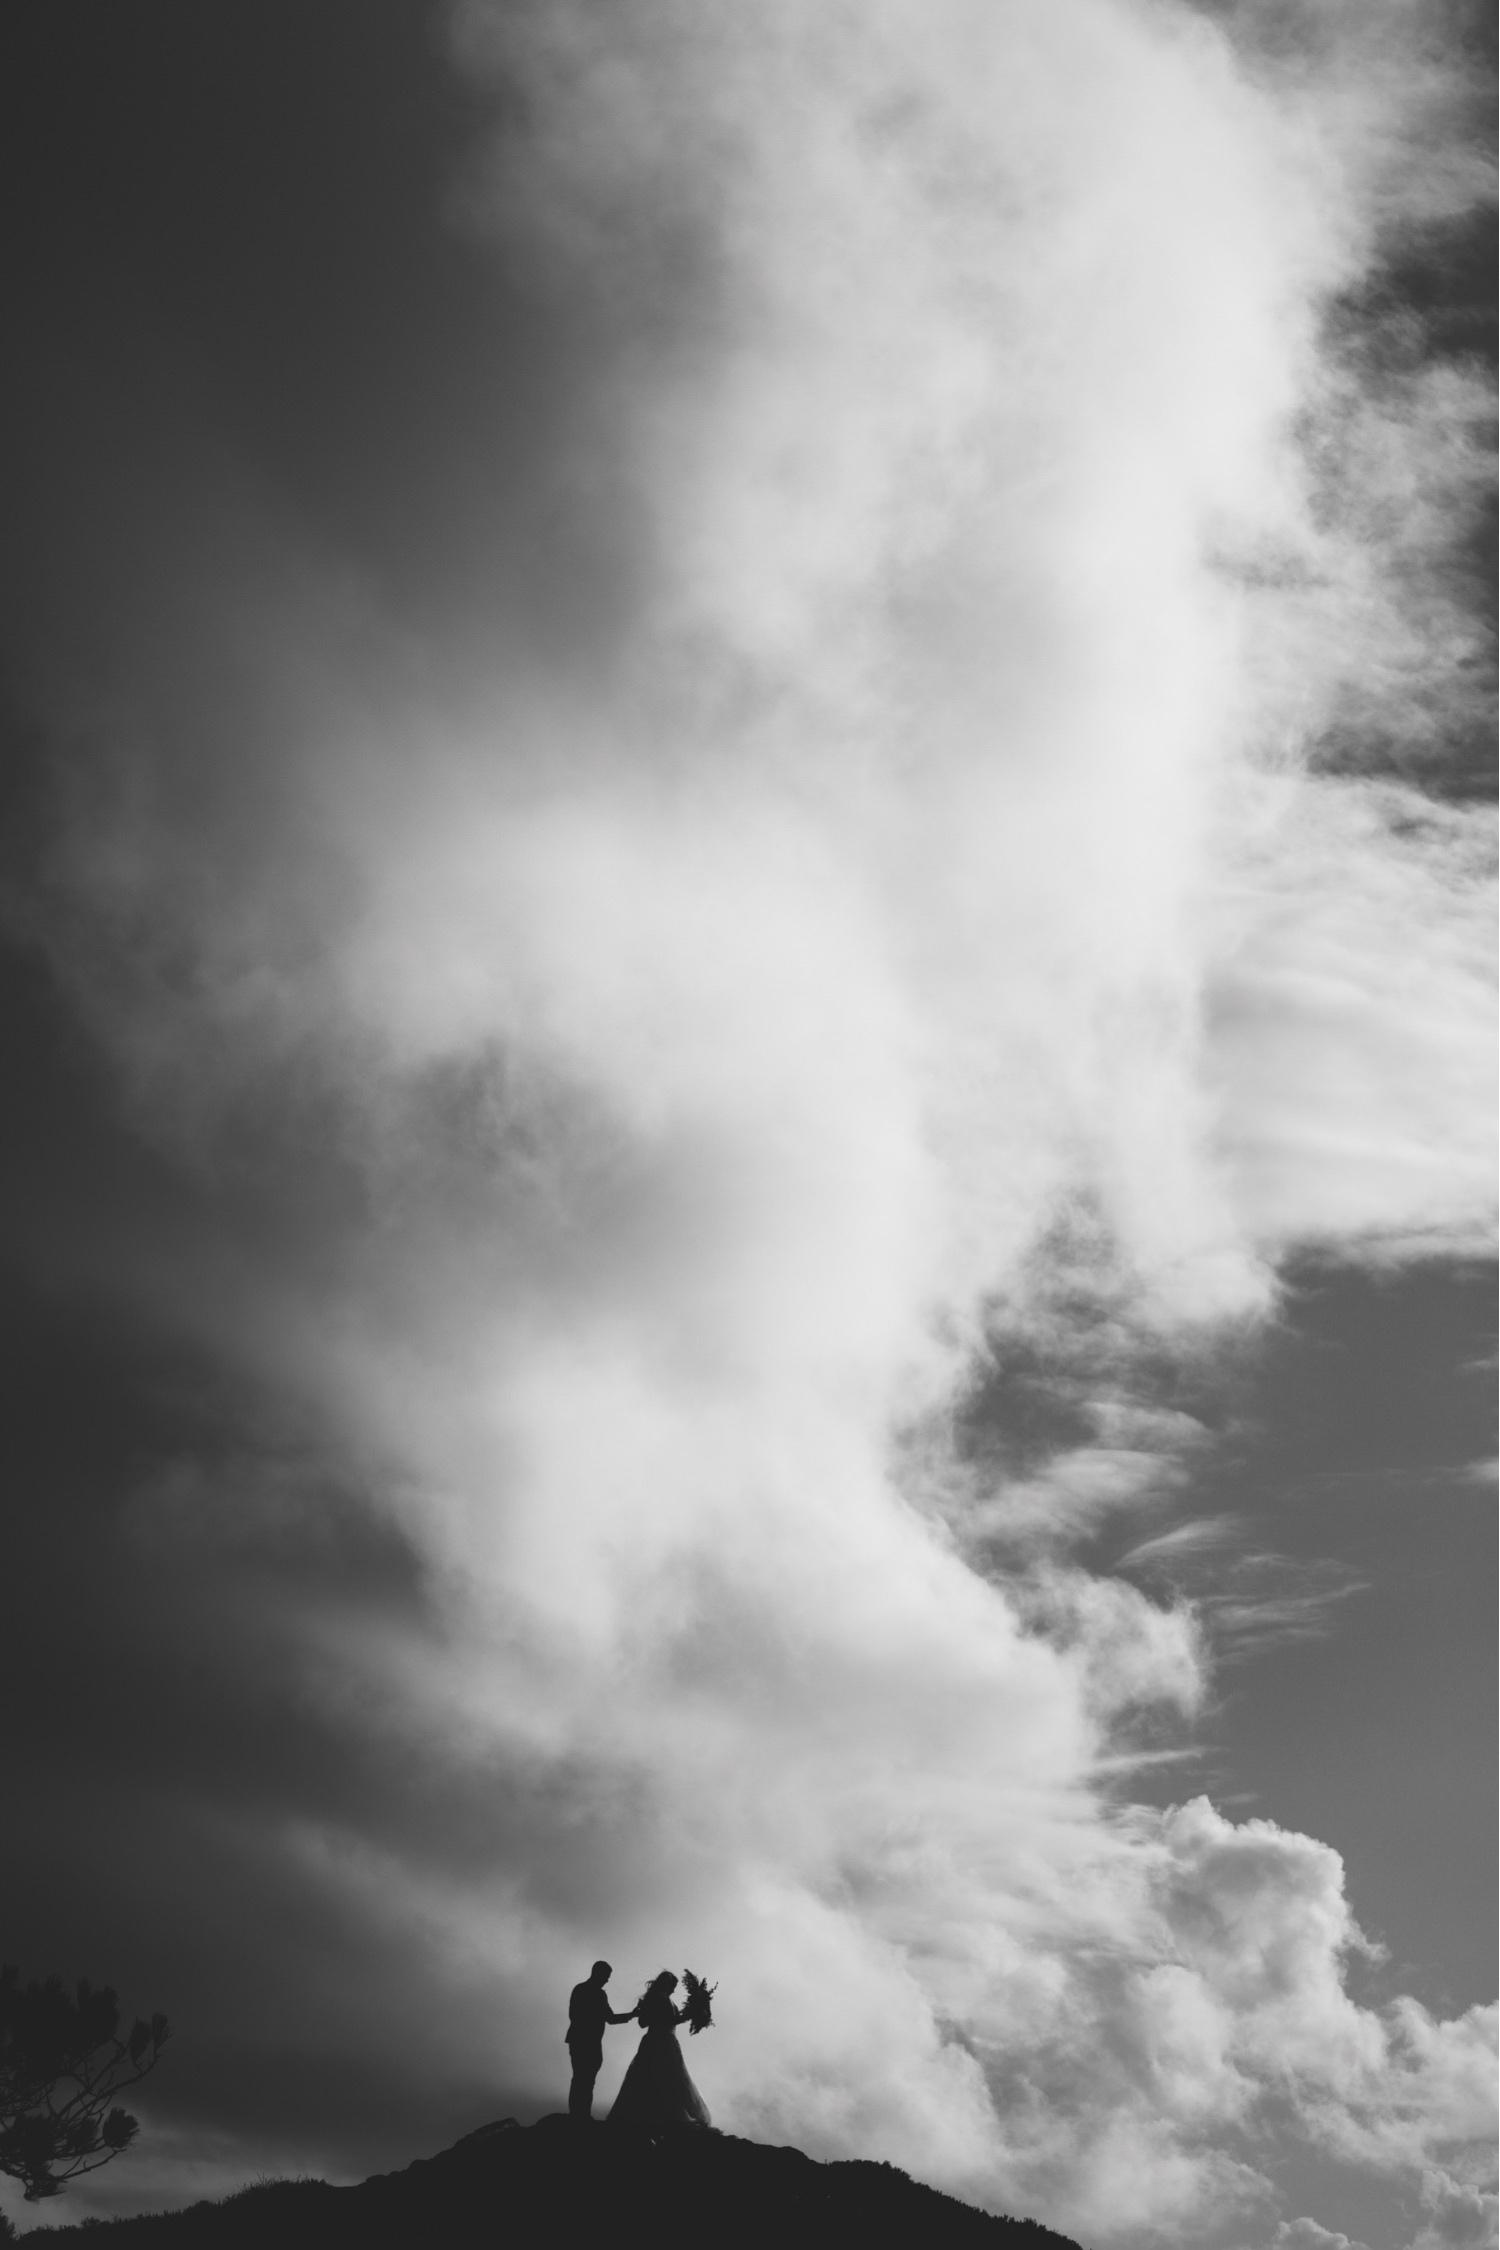 42_KBelope-388_adventurous_holdinghands_blackandwhite_elopementphotographer_elopement_bigsur_blooms_big_sunset_extravaganza_zoe_wandering_burchard_romantic_adventure_b&w_sur_photographer.jpg